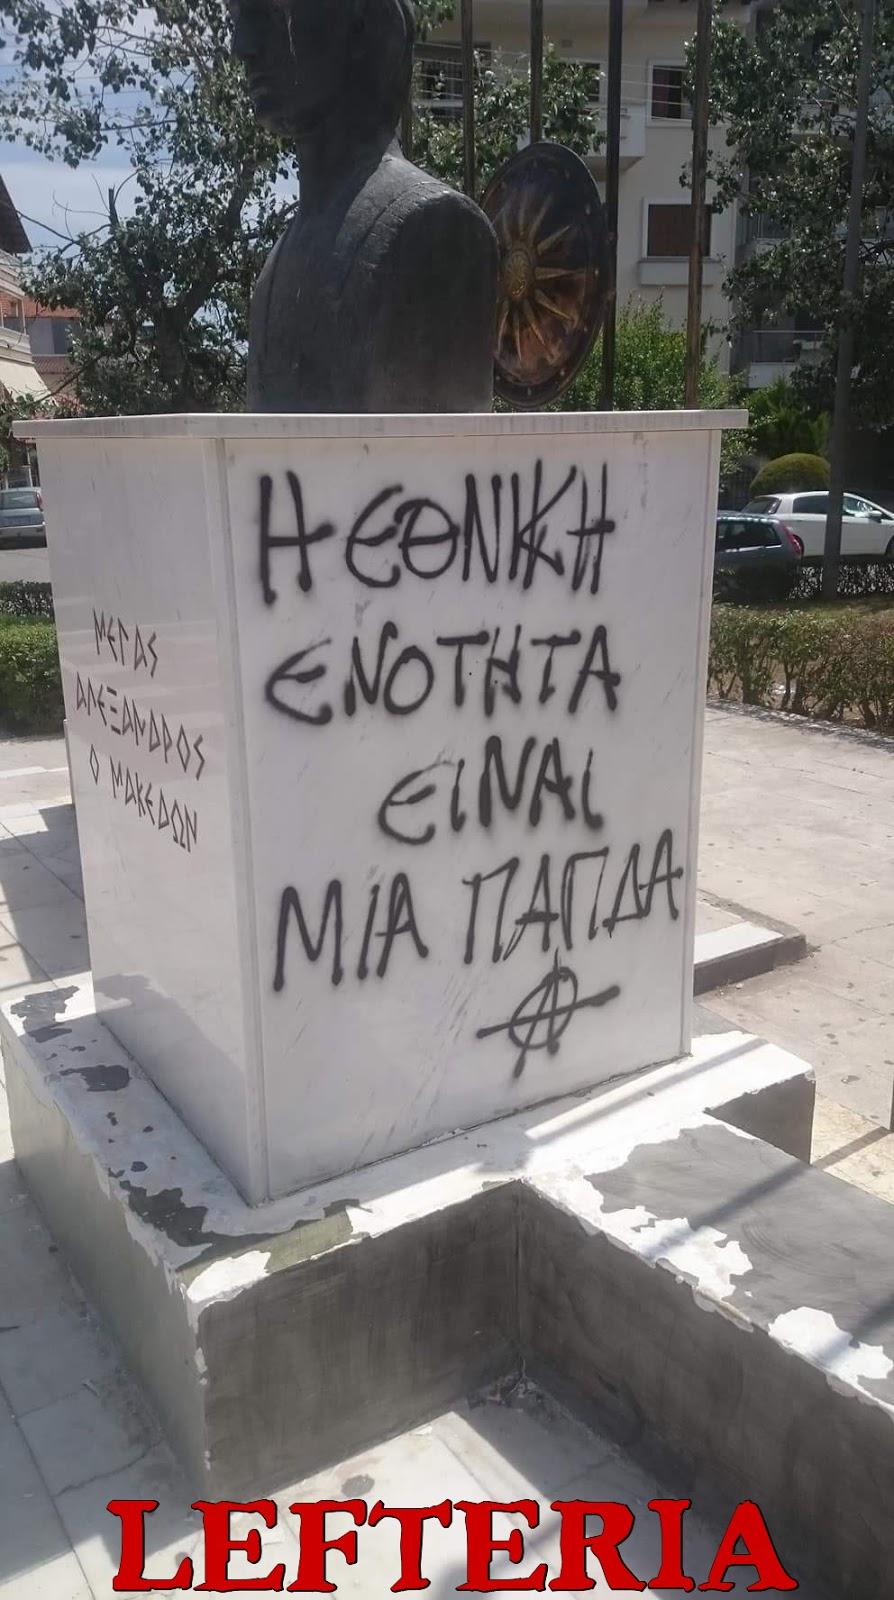 90cae4206c ΚΑΤΕΡΙΝΗ  Αναρχοπαρακρατικοί βεβήλωσαν την προτομή του Μεγάλου Αλεξάνδρου  δύο μέρες πριν το παλλαϊκό συλλαλητήριο για τη Μακεδονία - ΟΡΓΗ ΑΠΟ ΤΟΥΣ  ΠΟΛΙΤΕΣ